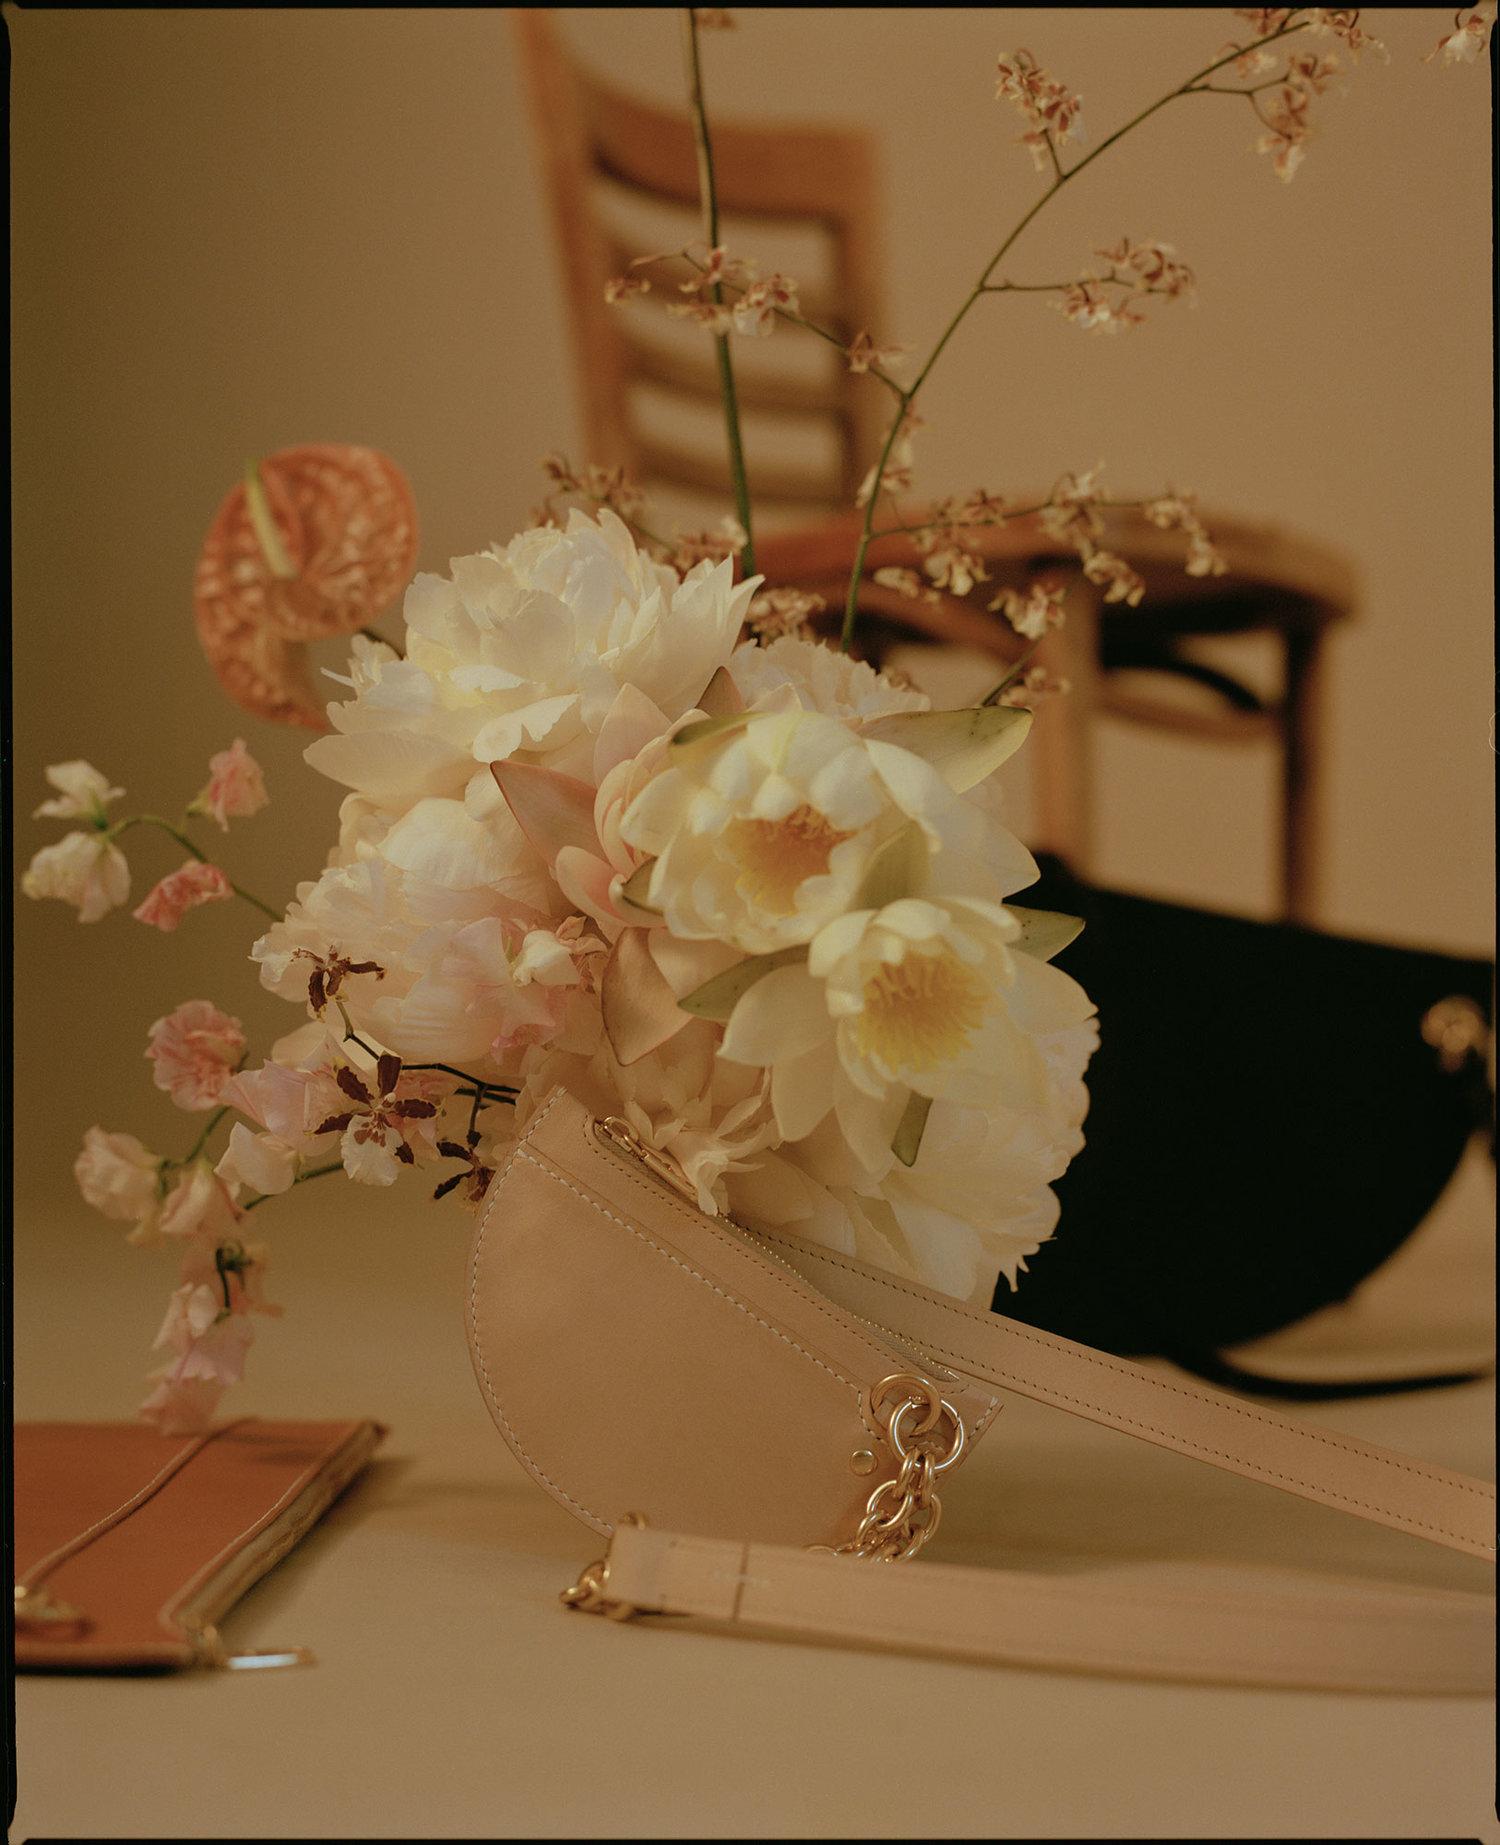 SIMETRIE - Photos | Drew Wheeler @drewbydrewbyModèles | Billie @billie_smolsy_Bela @bela_ph from IMG @imgmodelsDirection Artistique | Candice Agius @thecandyfeedStylisme | Thea Blocksidge @theabebeMaquillage + Coiffure | Georgia Ramman @georgiarammanAssistant Photo | Enrico Kas @enricokasArtiste florale | Hattie Molloy @hattiemolloysimetrie.com.au